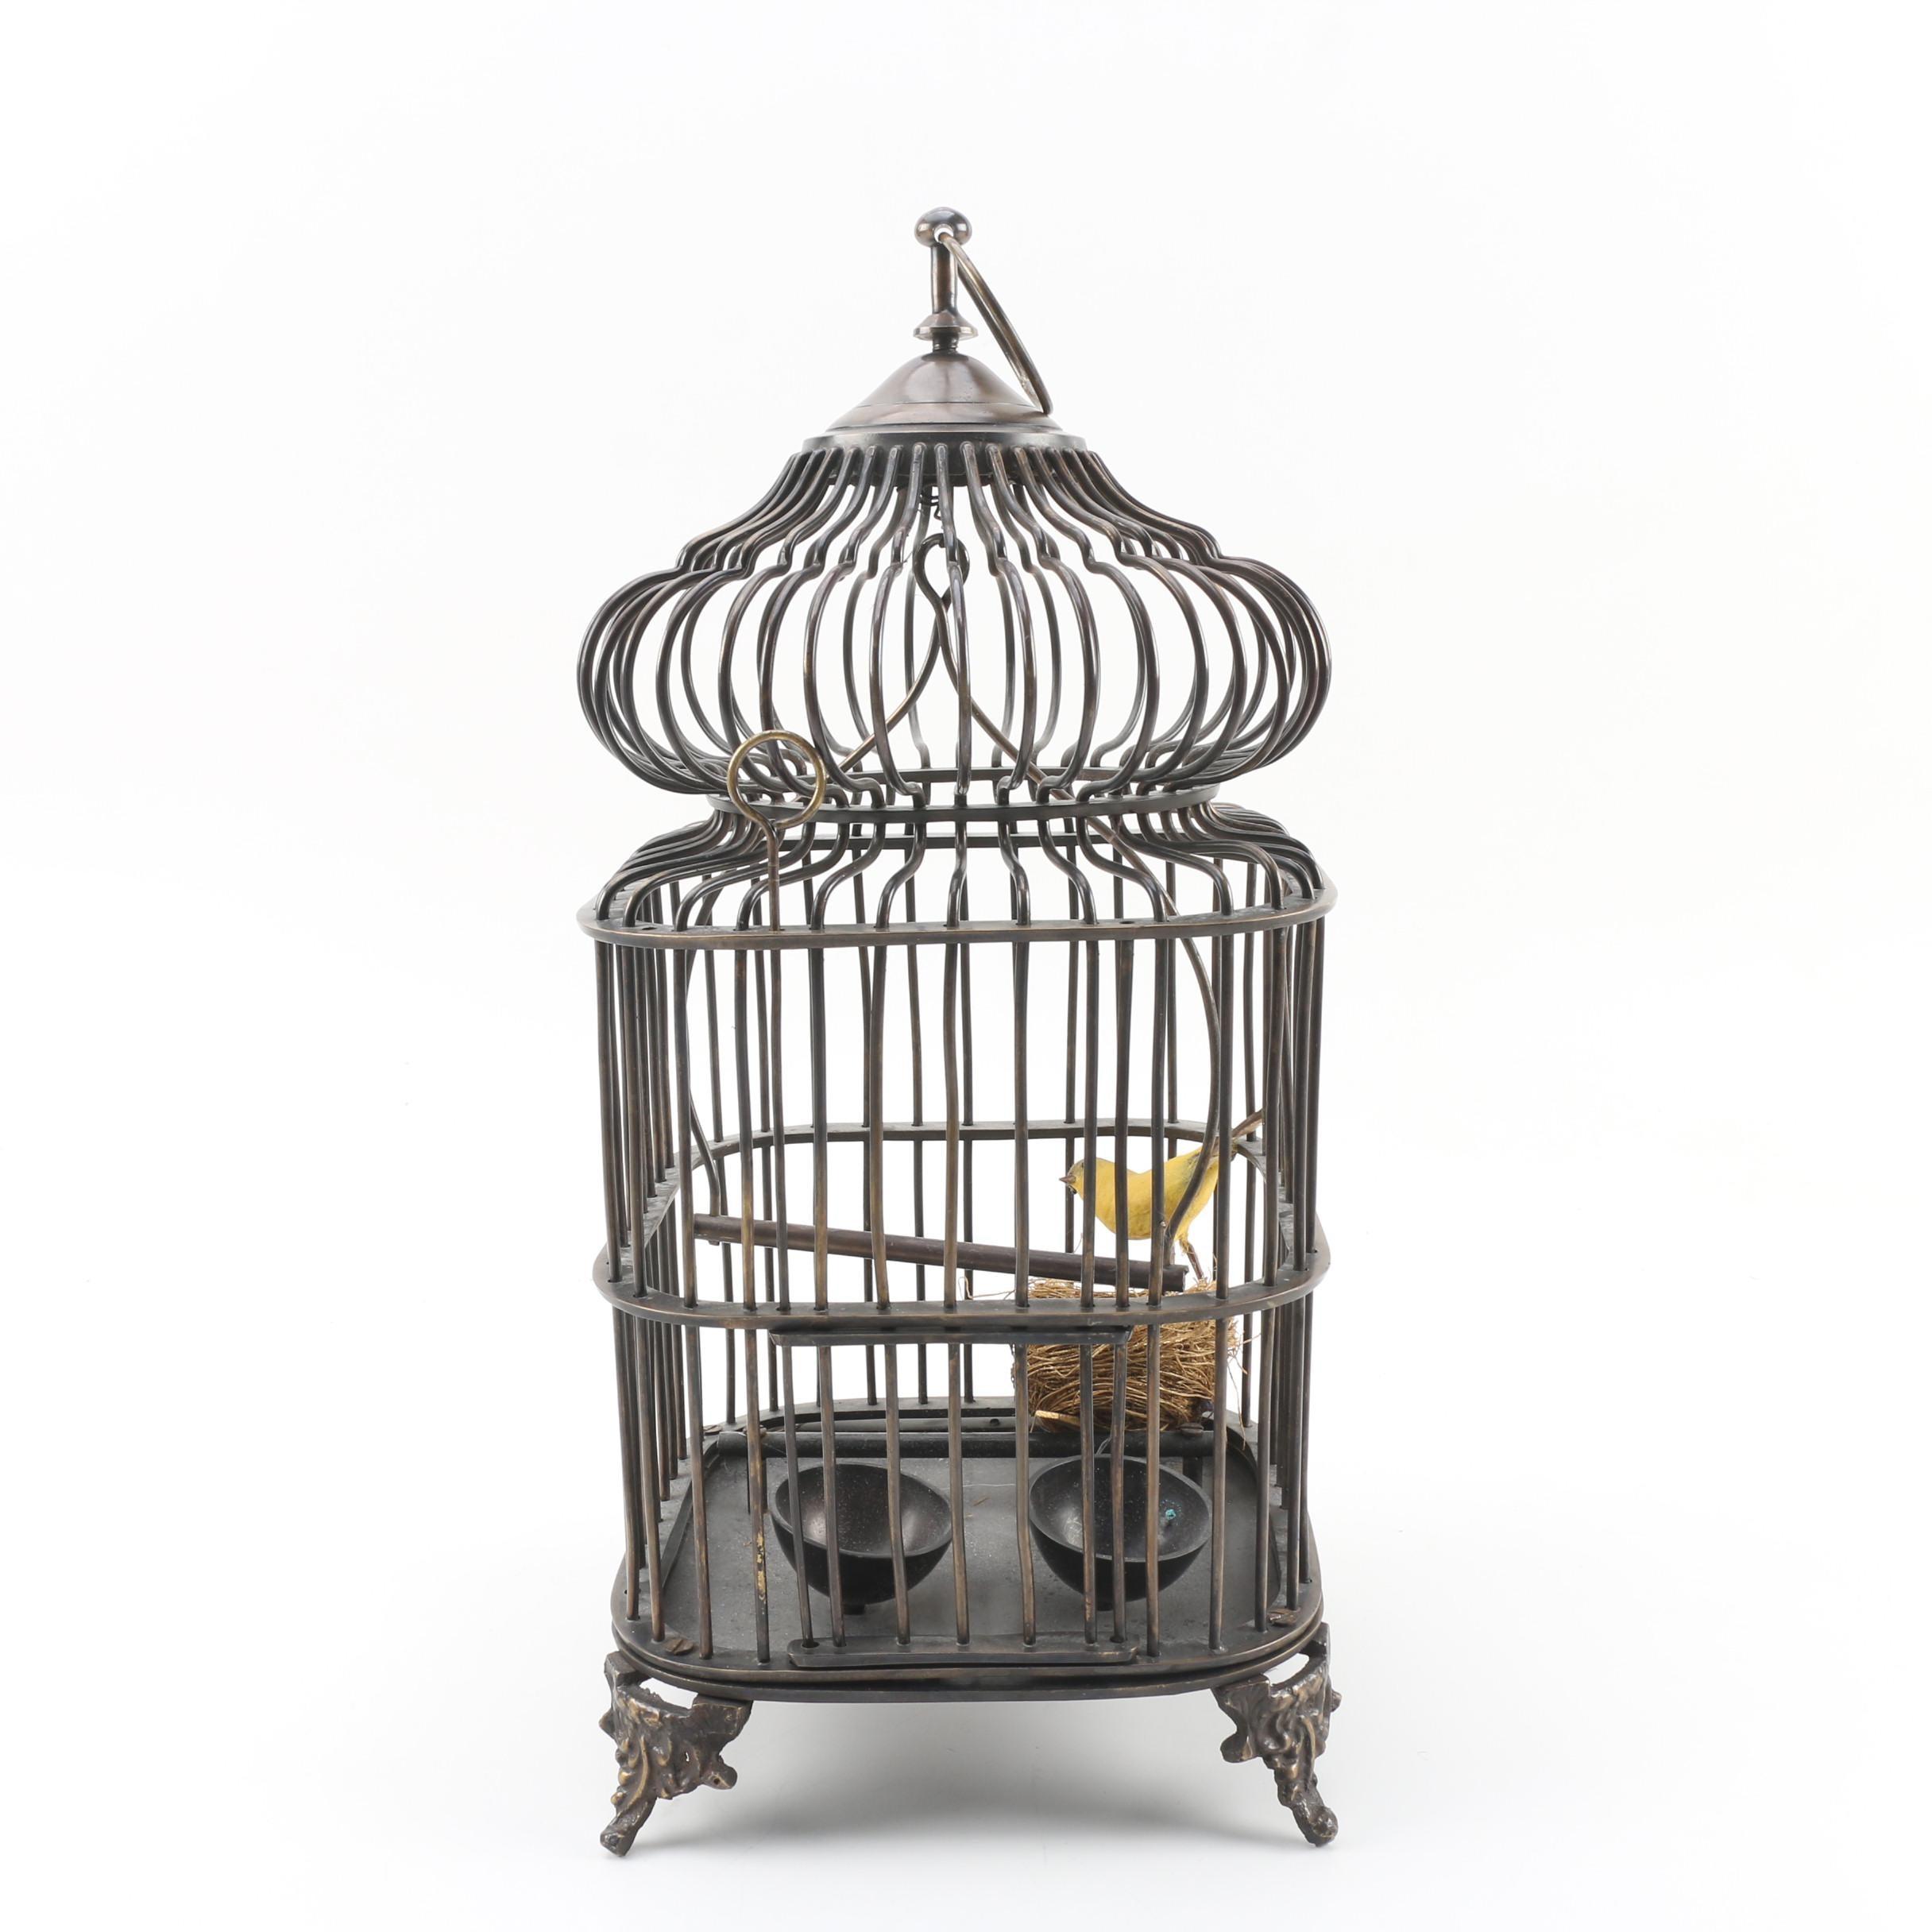 Castilian Imports Decorative Brass Bird Cage with Bird Figurine